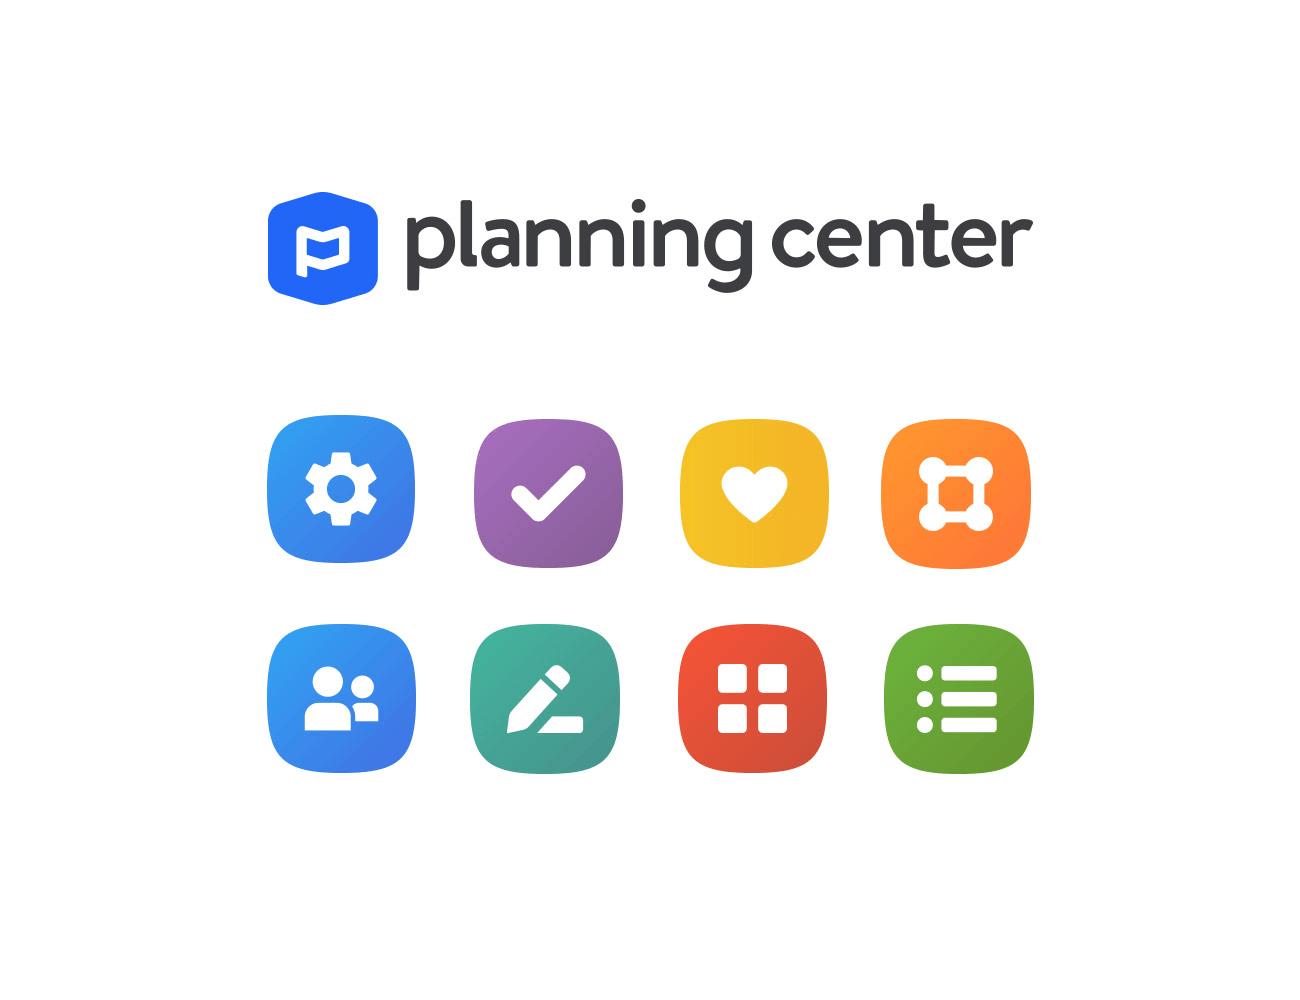 planningcenteronline